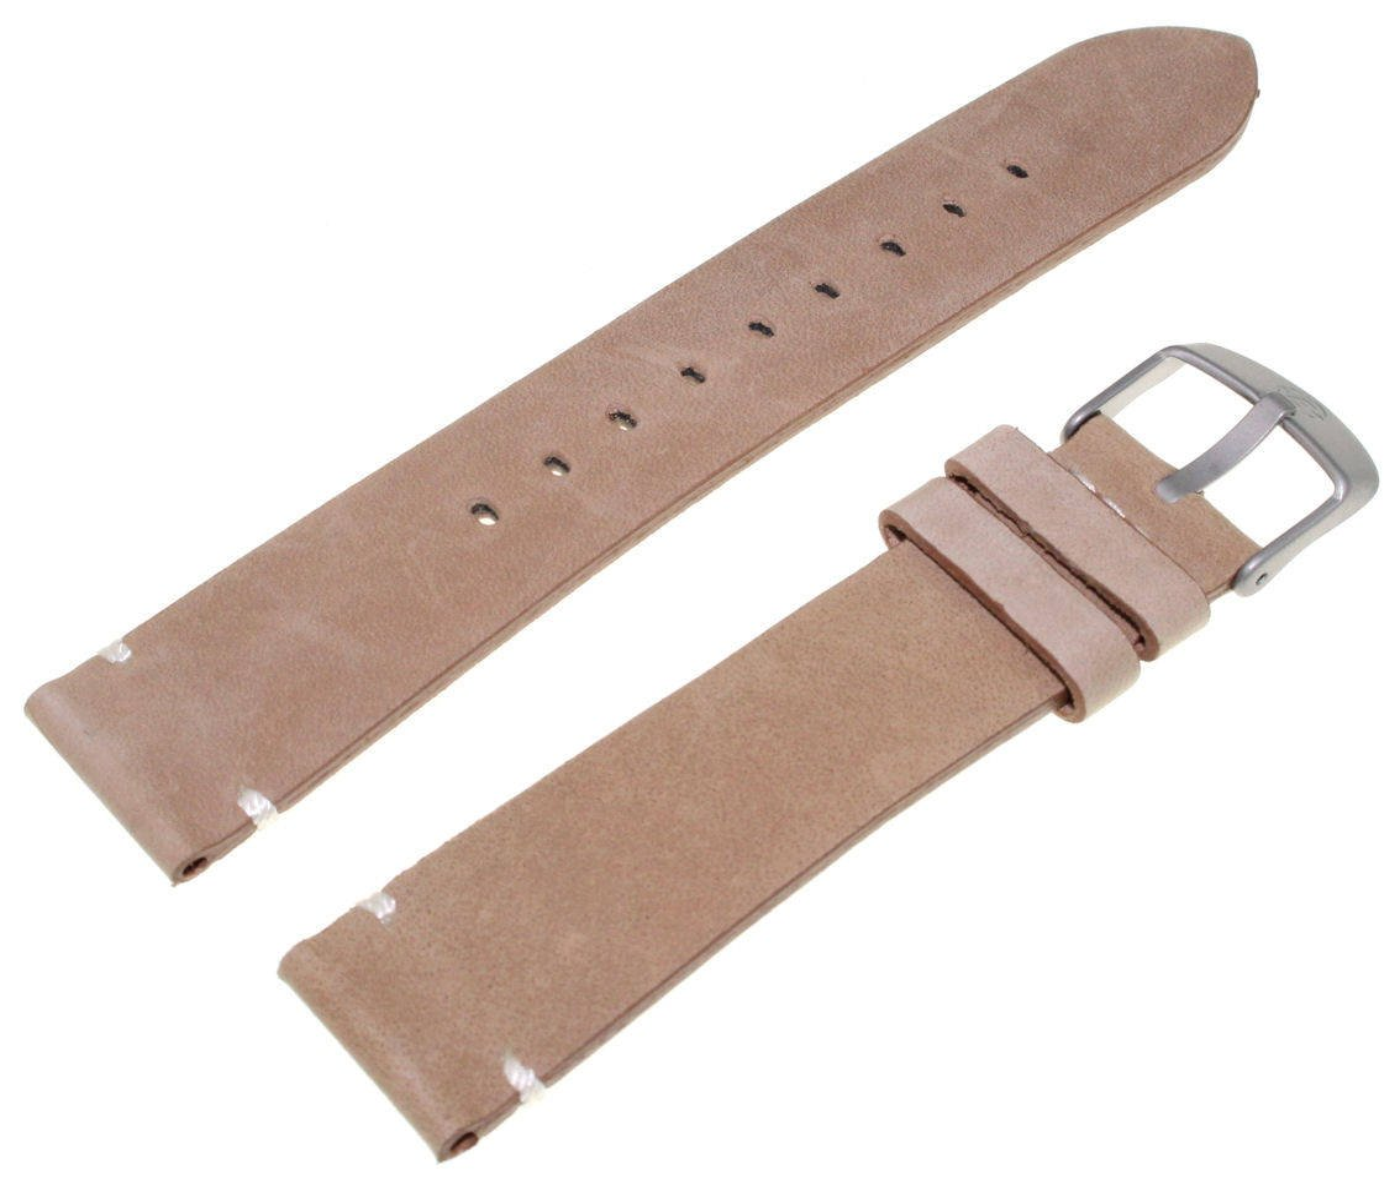 d5eea4fb03835 Pasek do zegarka Timex TW4B01800 PW4B01800 20 mm Skóra - sklep ...